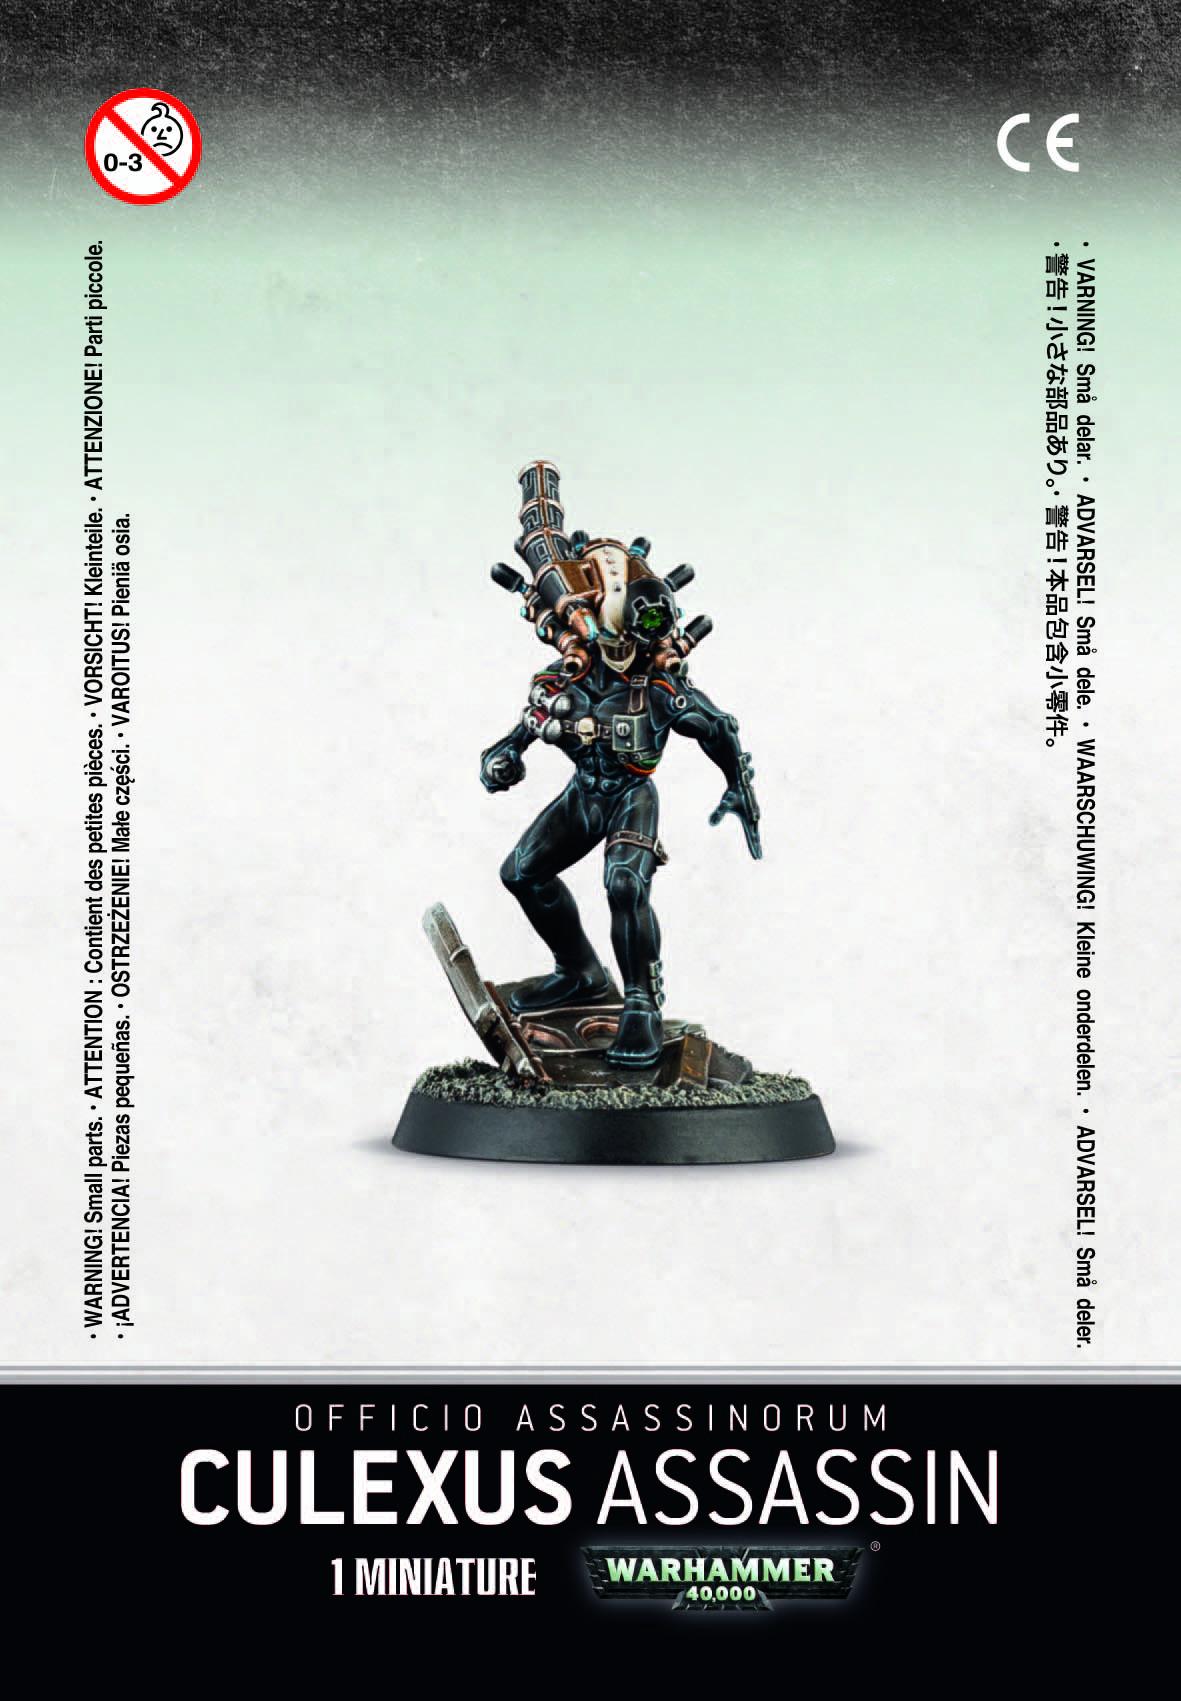 Culexus Assassin